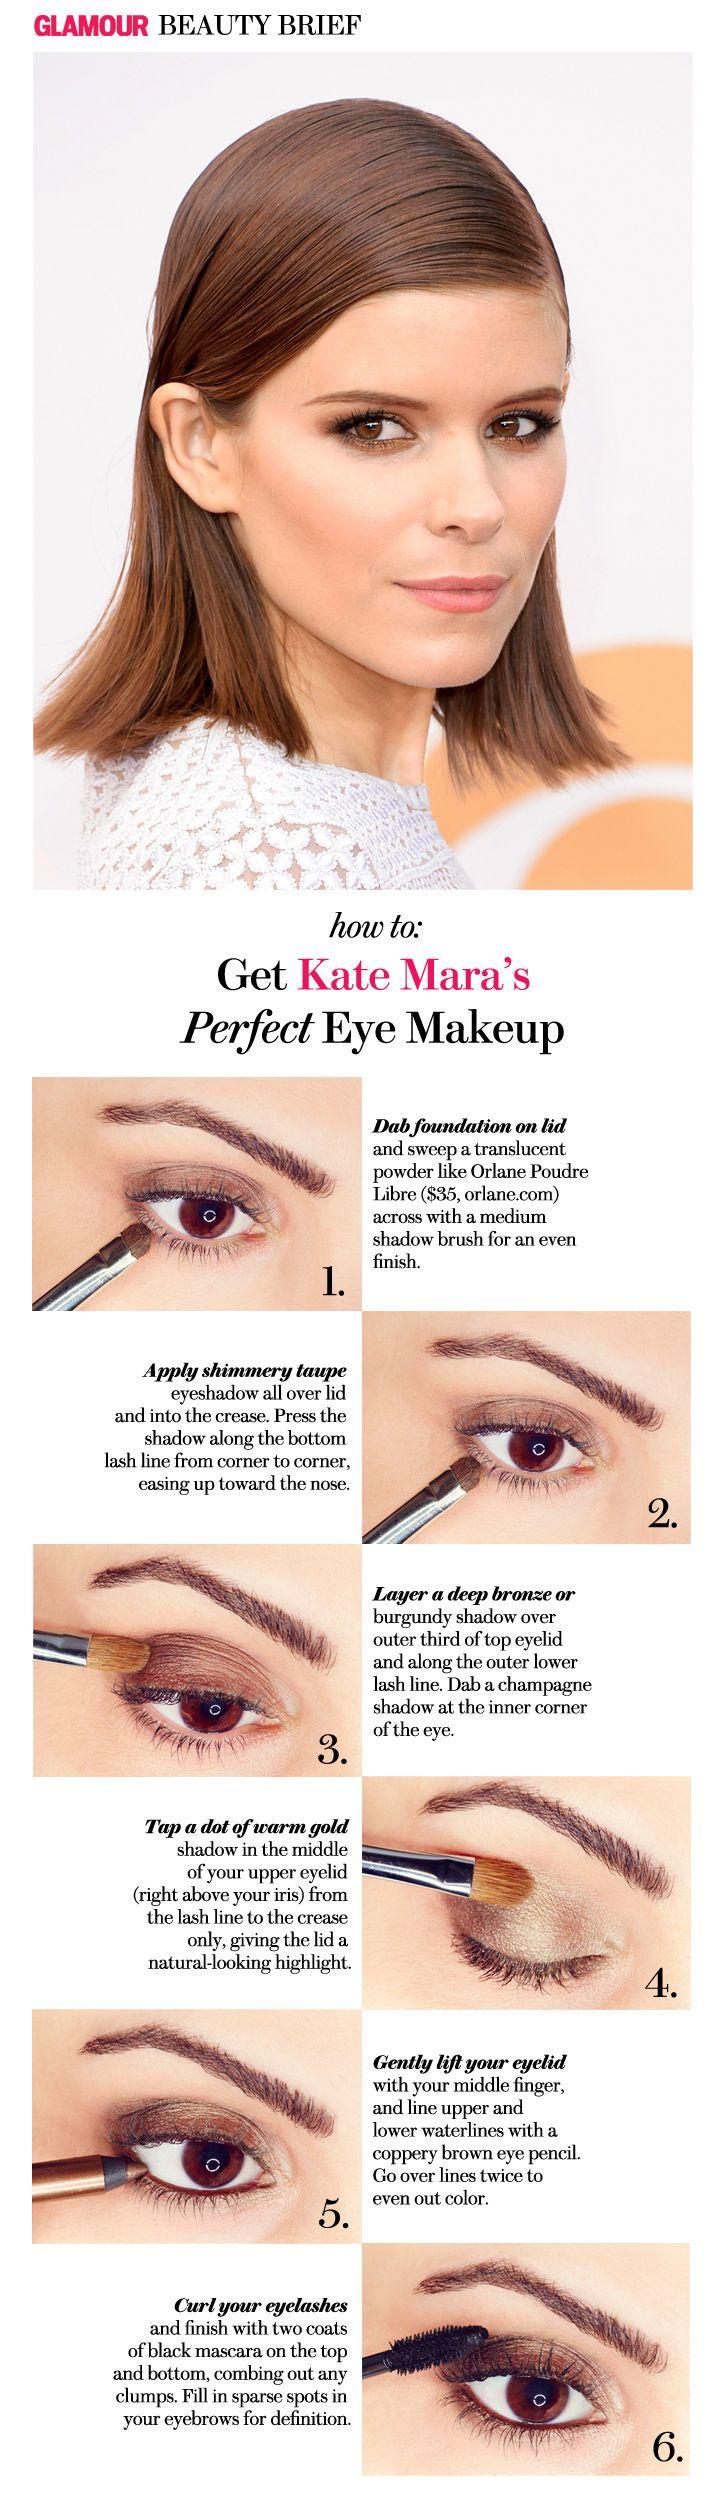 How to Copy Kate Mara's Perfect Smoky Bronze Eye Makeup